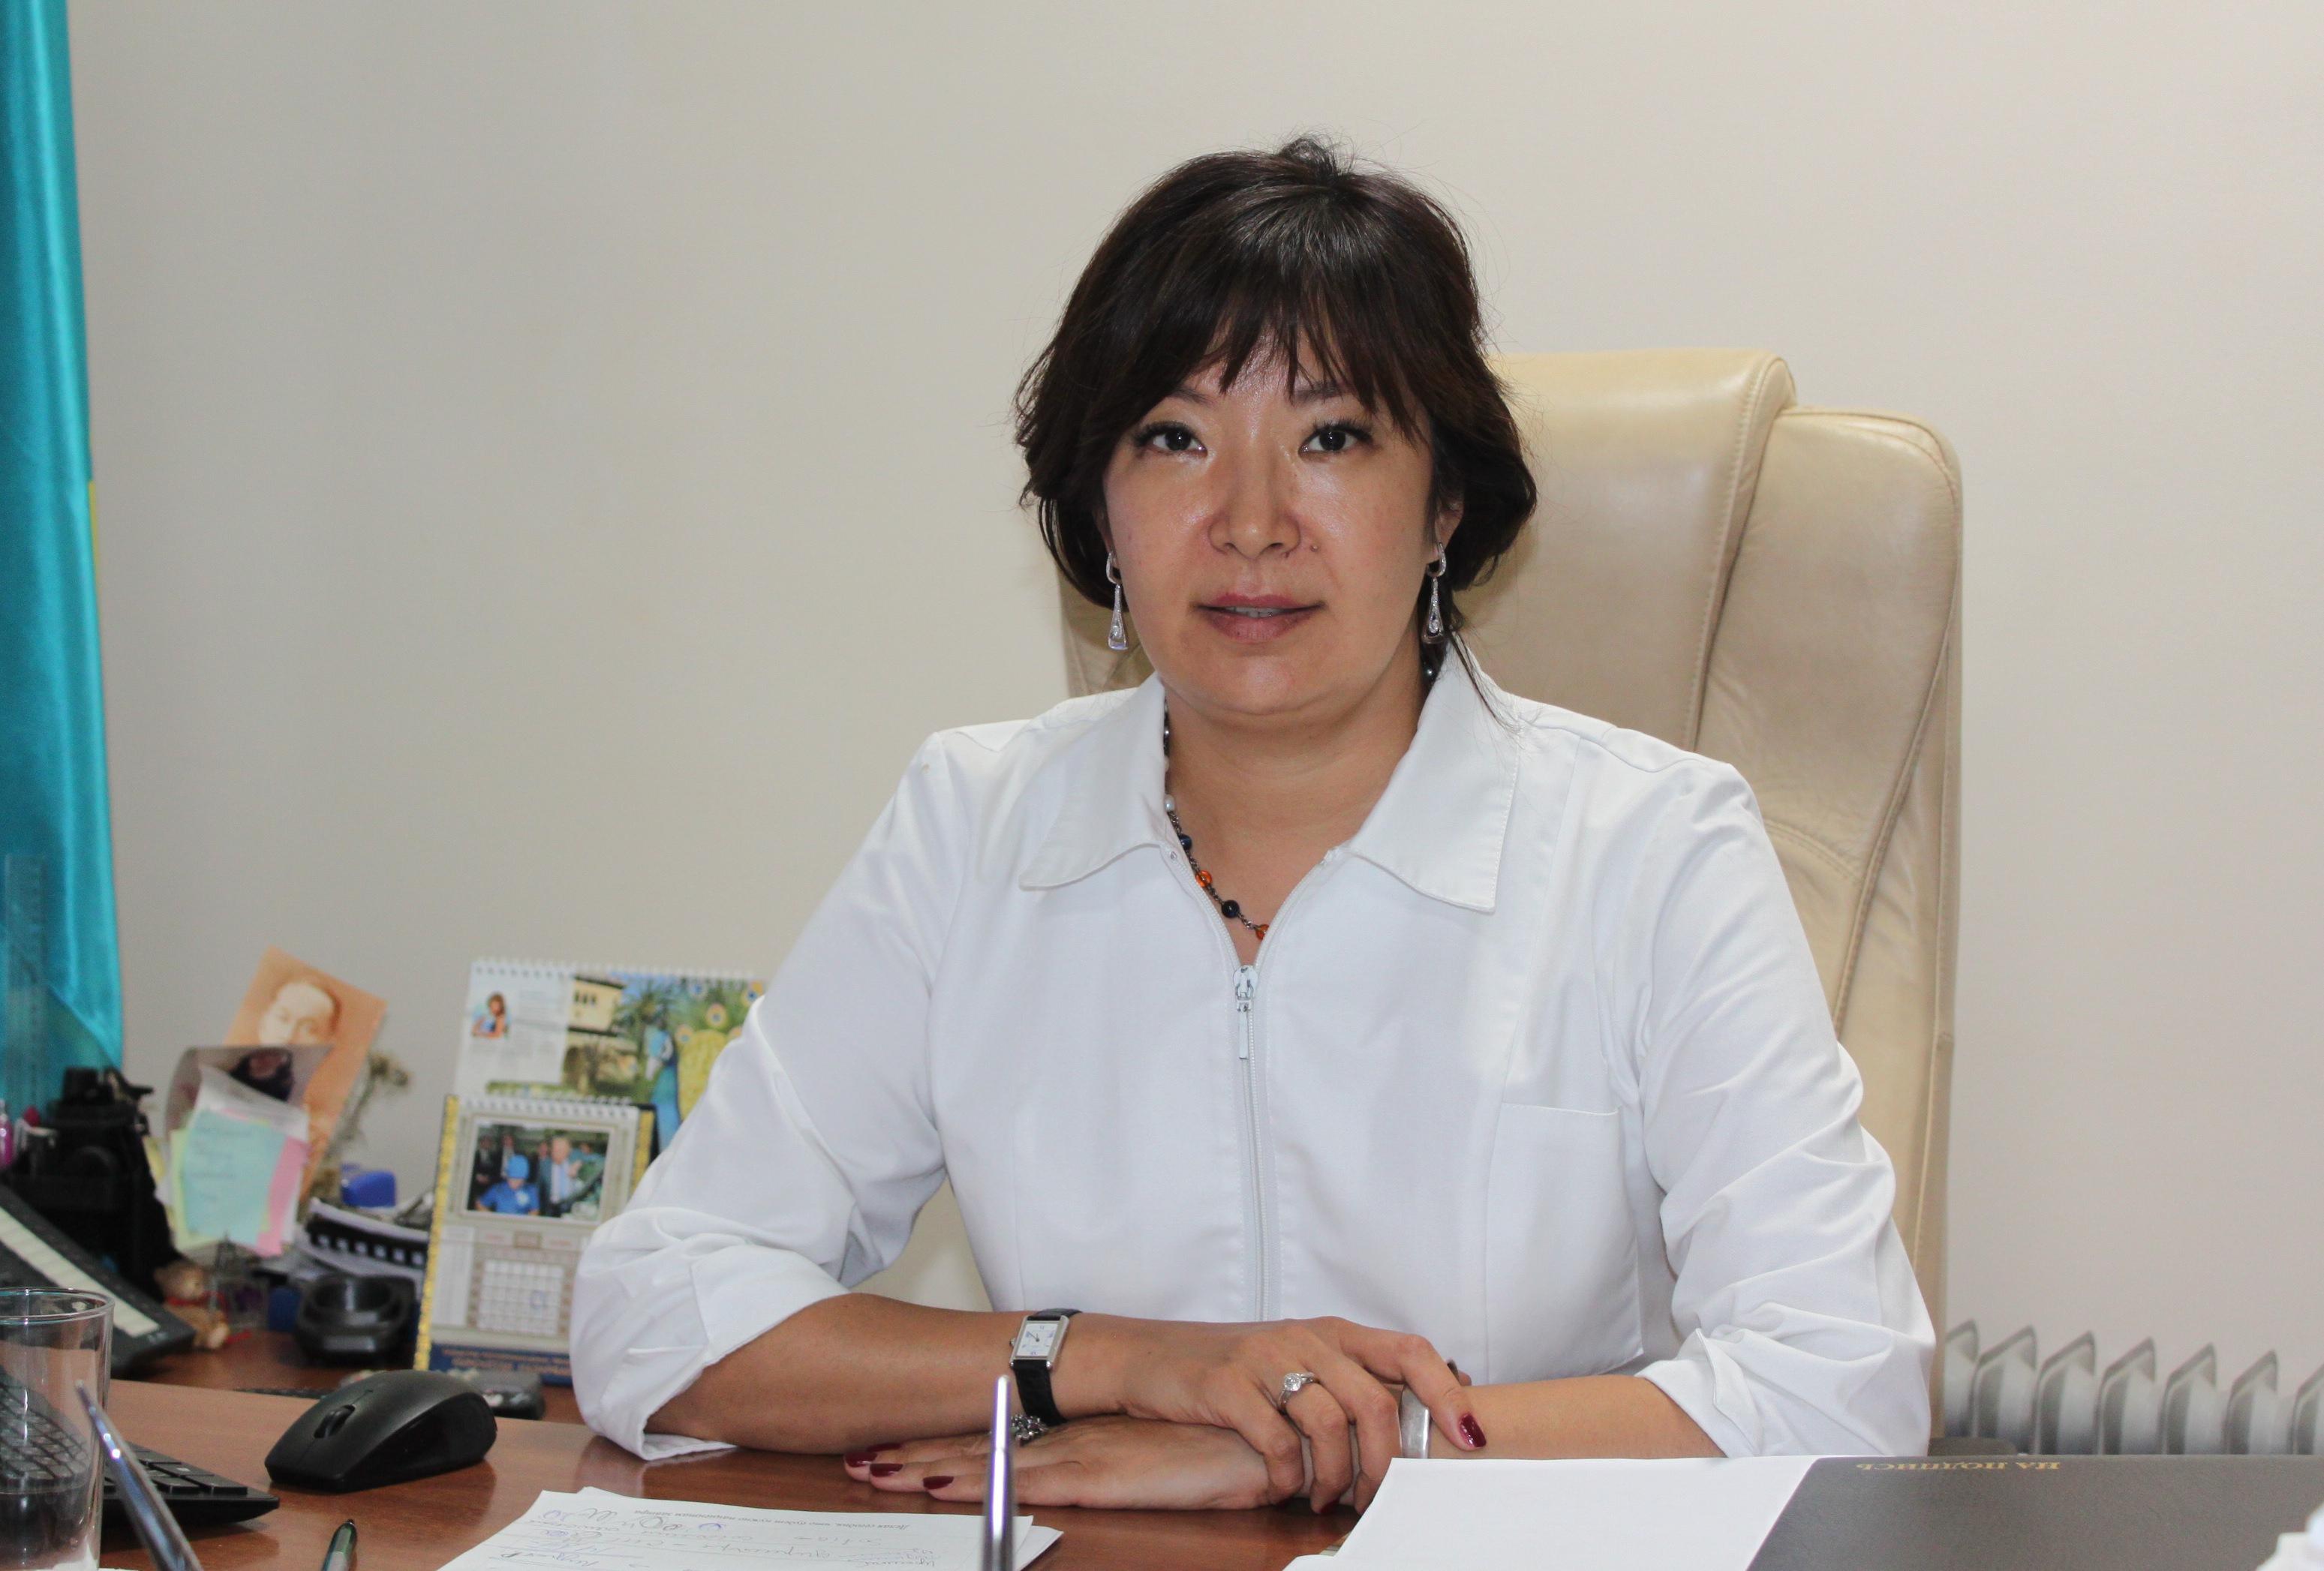 Отклик на Послание Президента Казахстана Н.А. Назарбаева от 05 октября 2018 года «Рост благосостояния казахстанцев: повышение доходов и качества жизни»